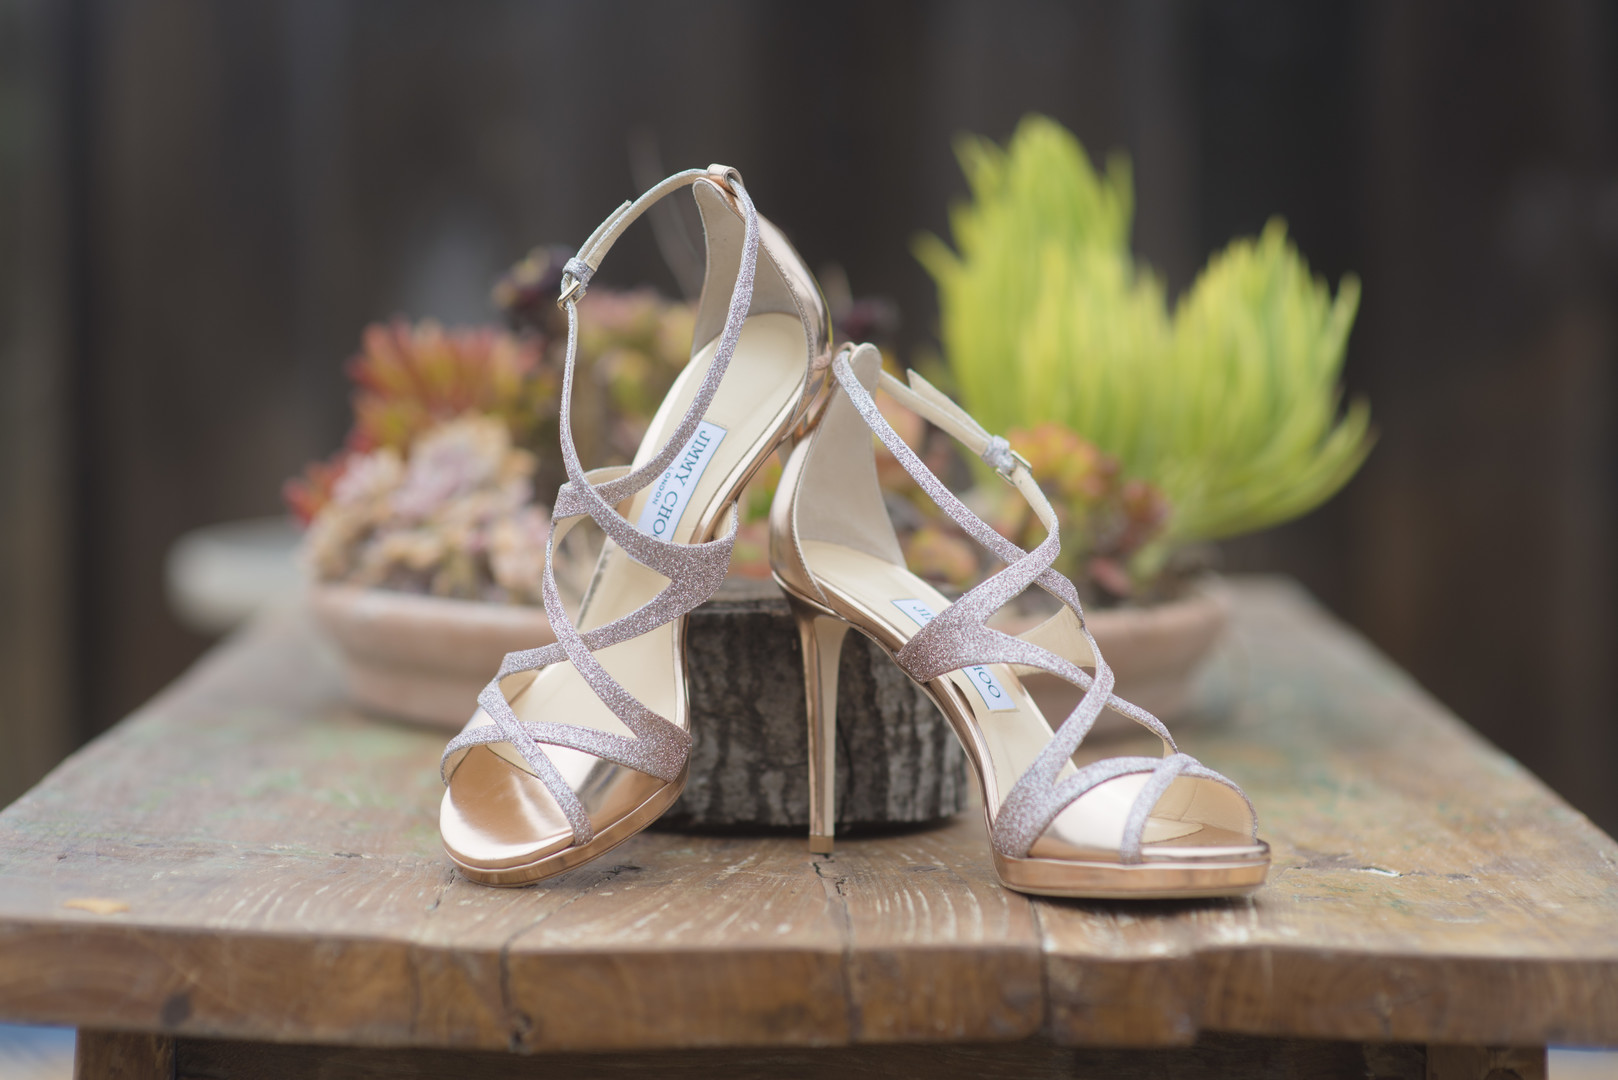 www.santabarbarawedding.com | Venue: Dos Pueblos Ranch | Photographer: ByCherry Photography | Event Designer: Elan Event Rentals | Bridal Heels